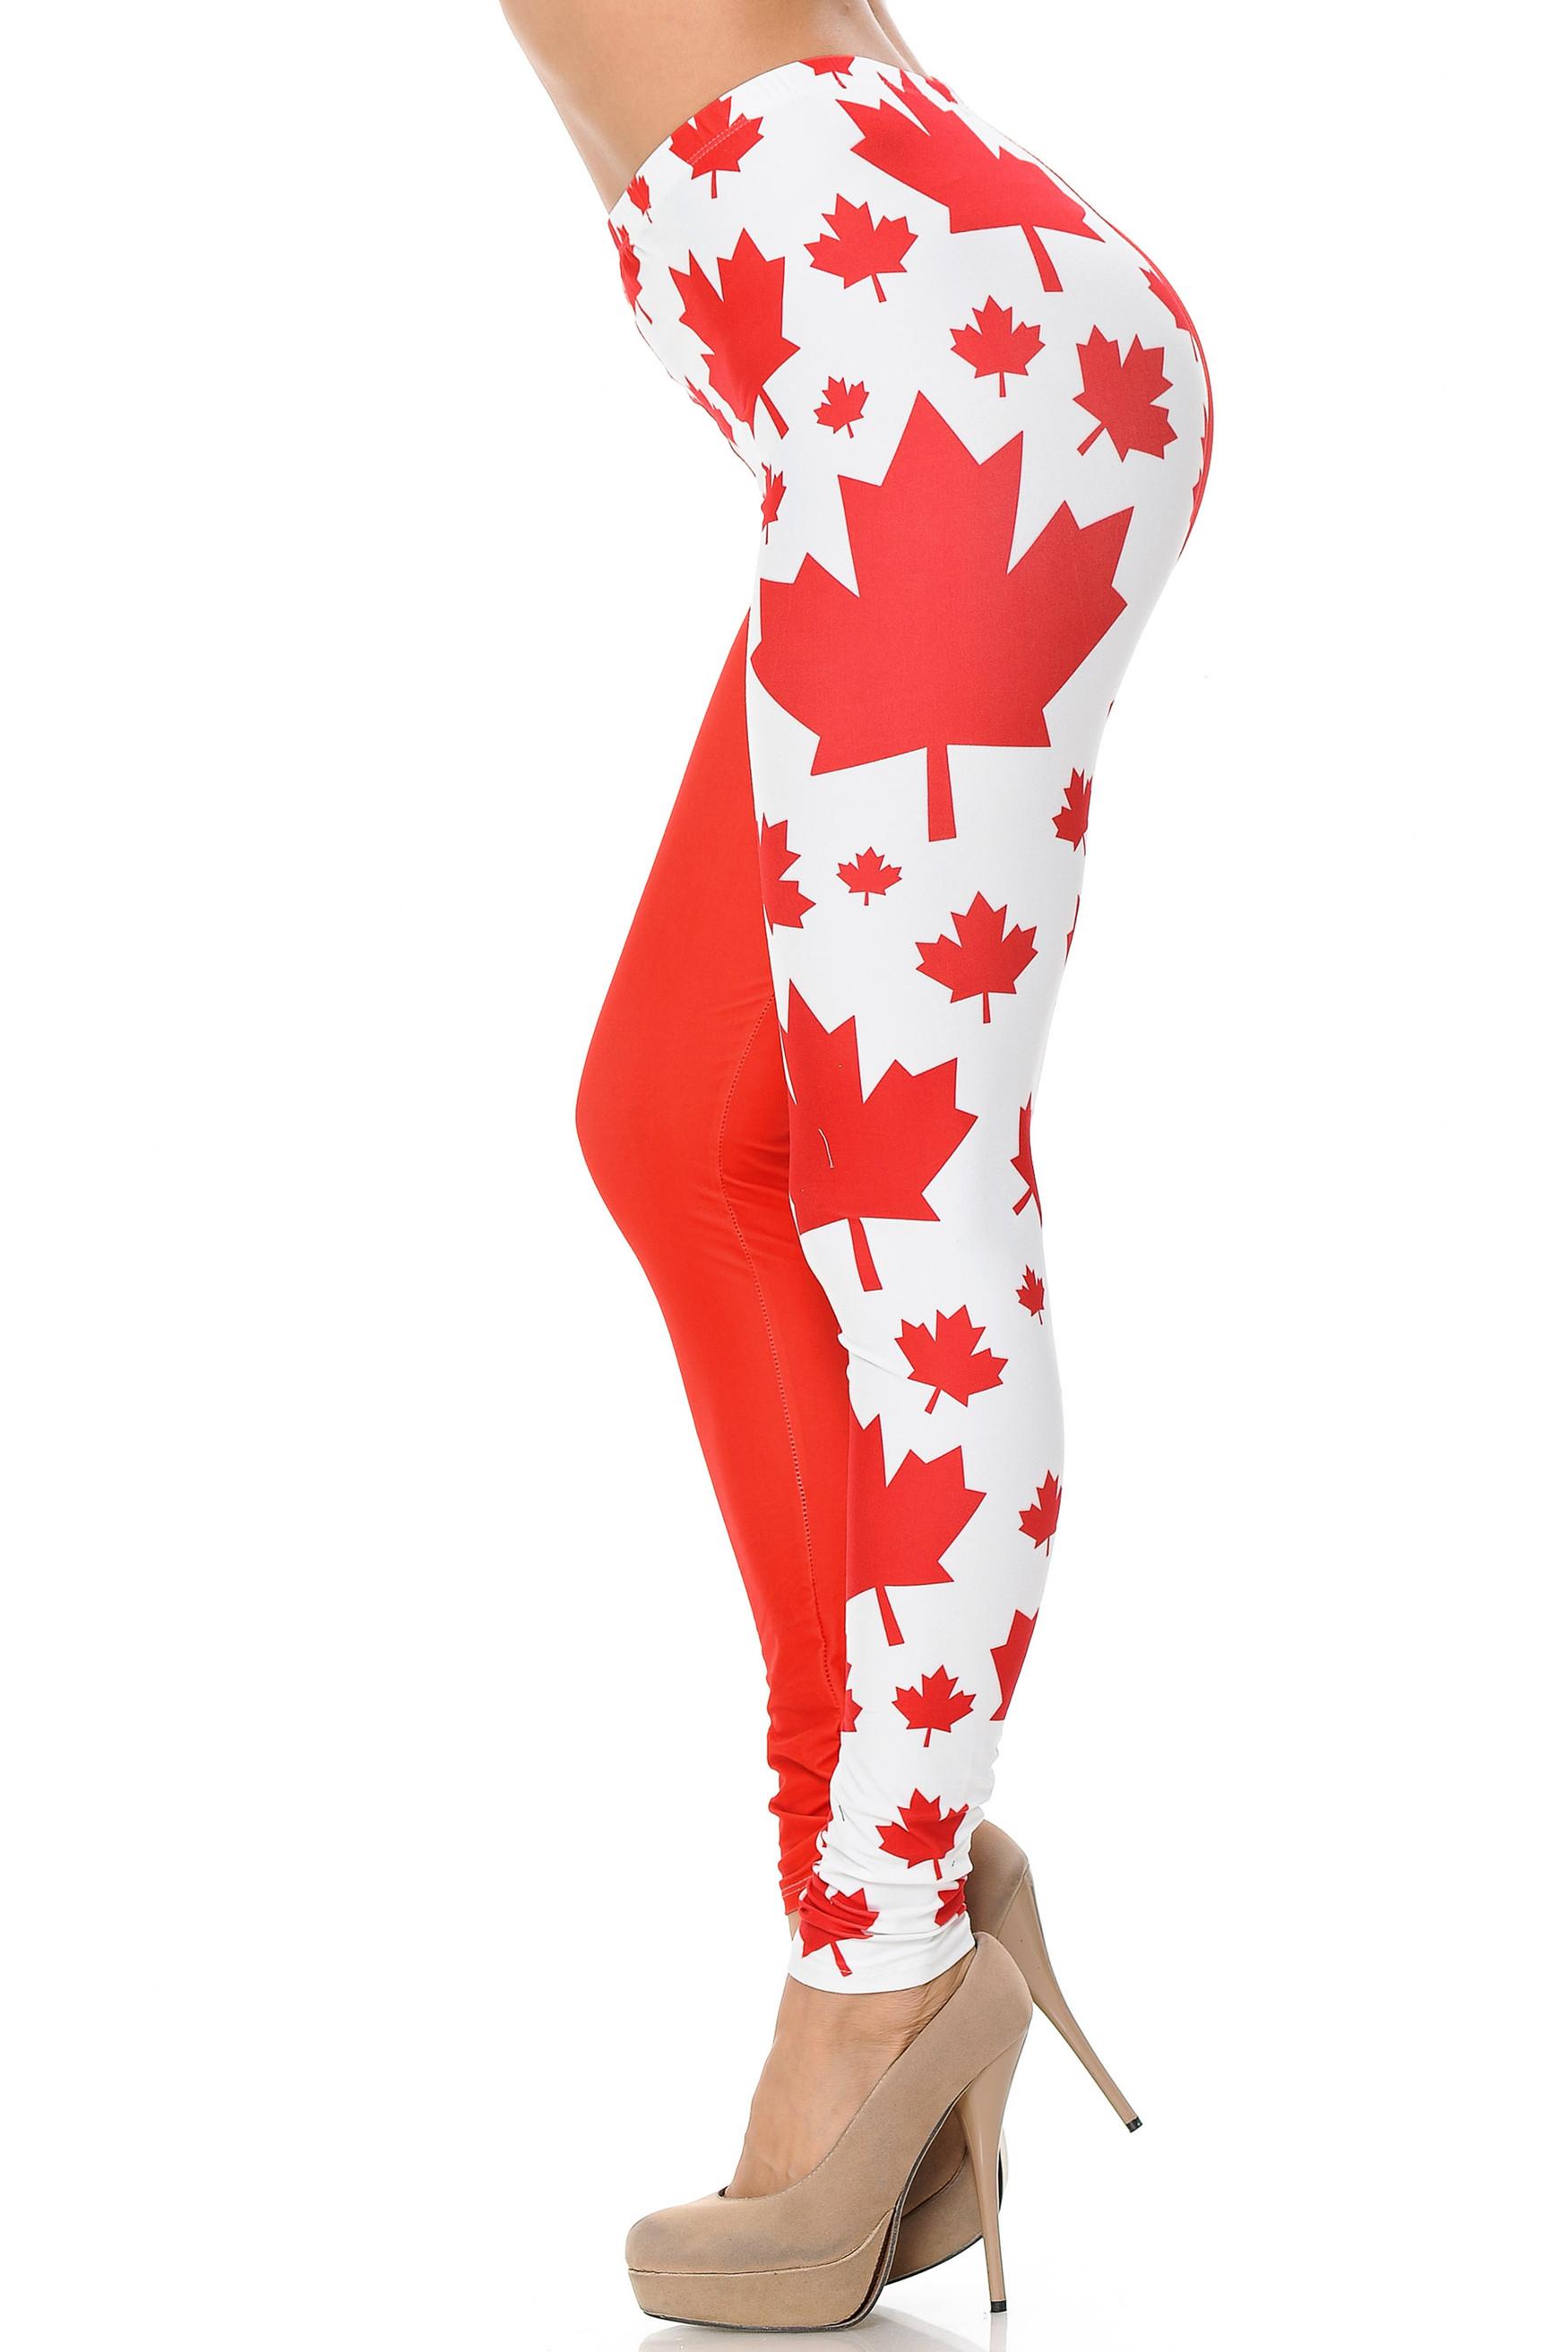 Creamy Soft Canadian Flag Plus Size Leggings